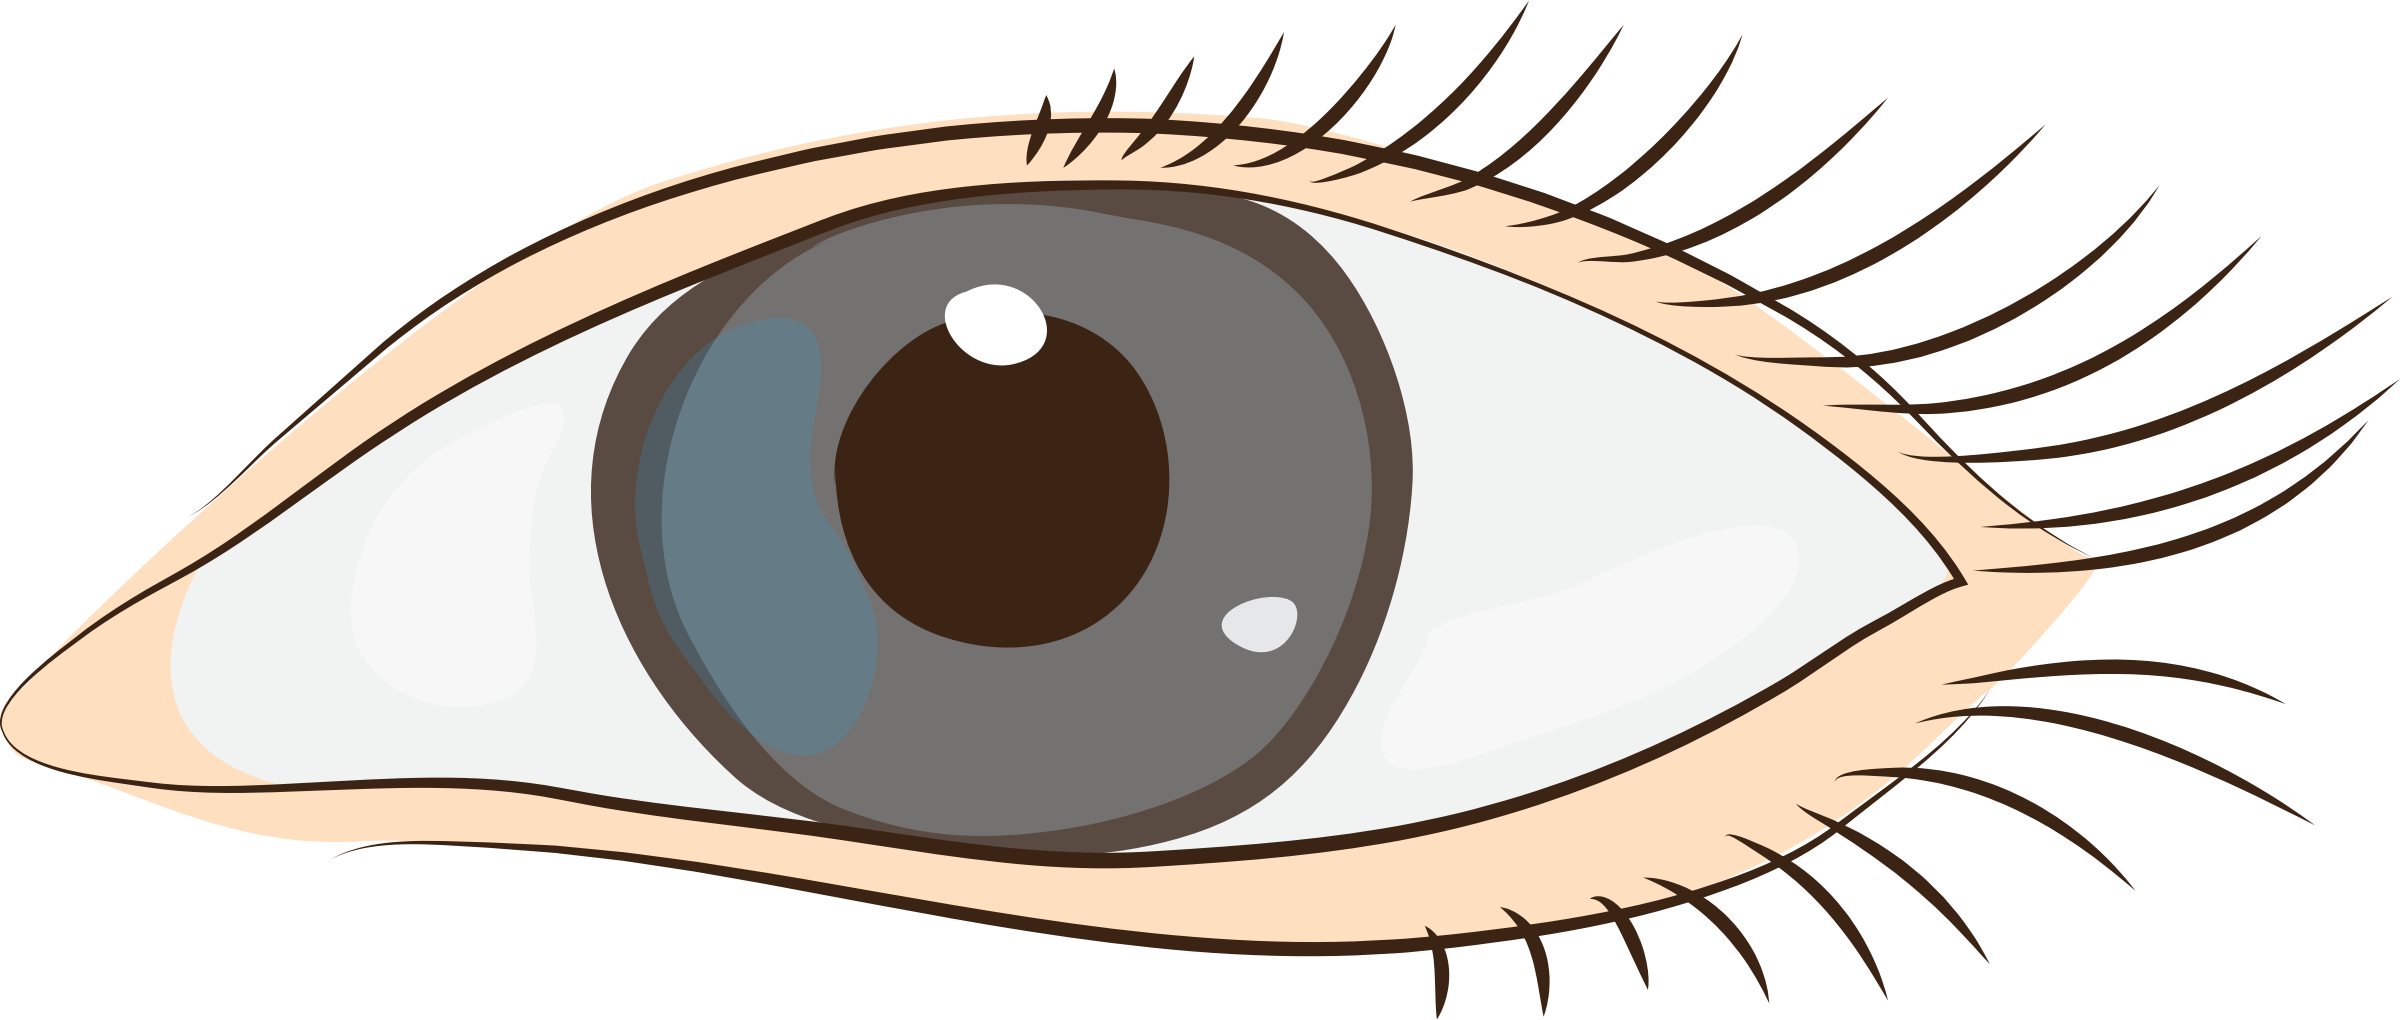 Stye blepharitis eye transprent. Eyelashes clipart eyelid